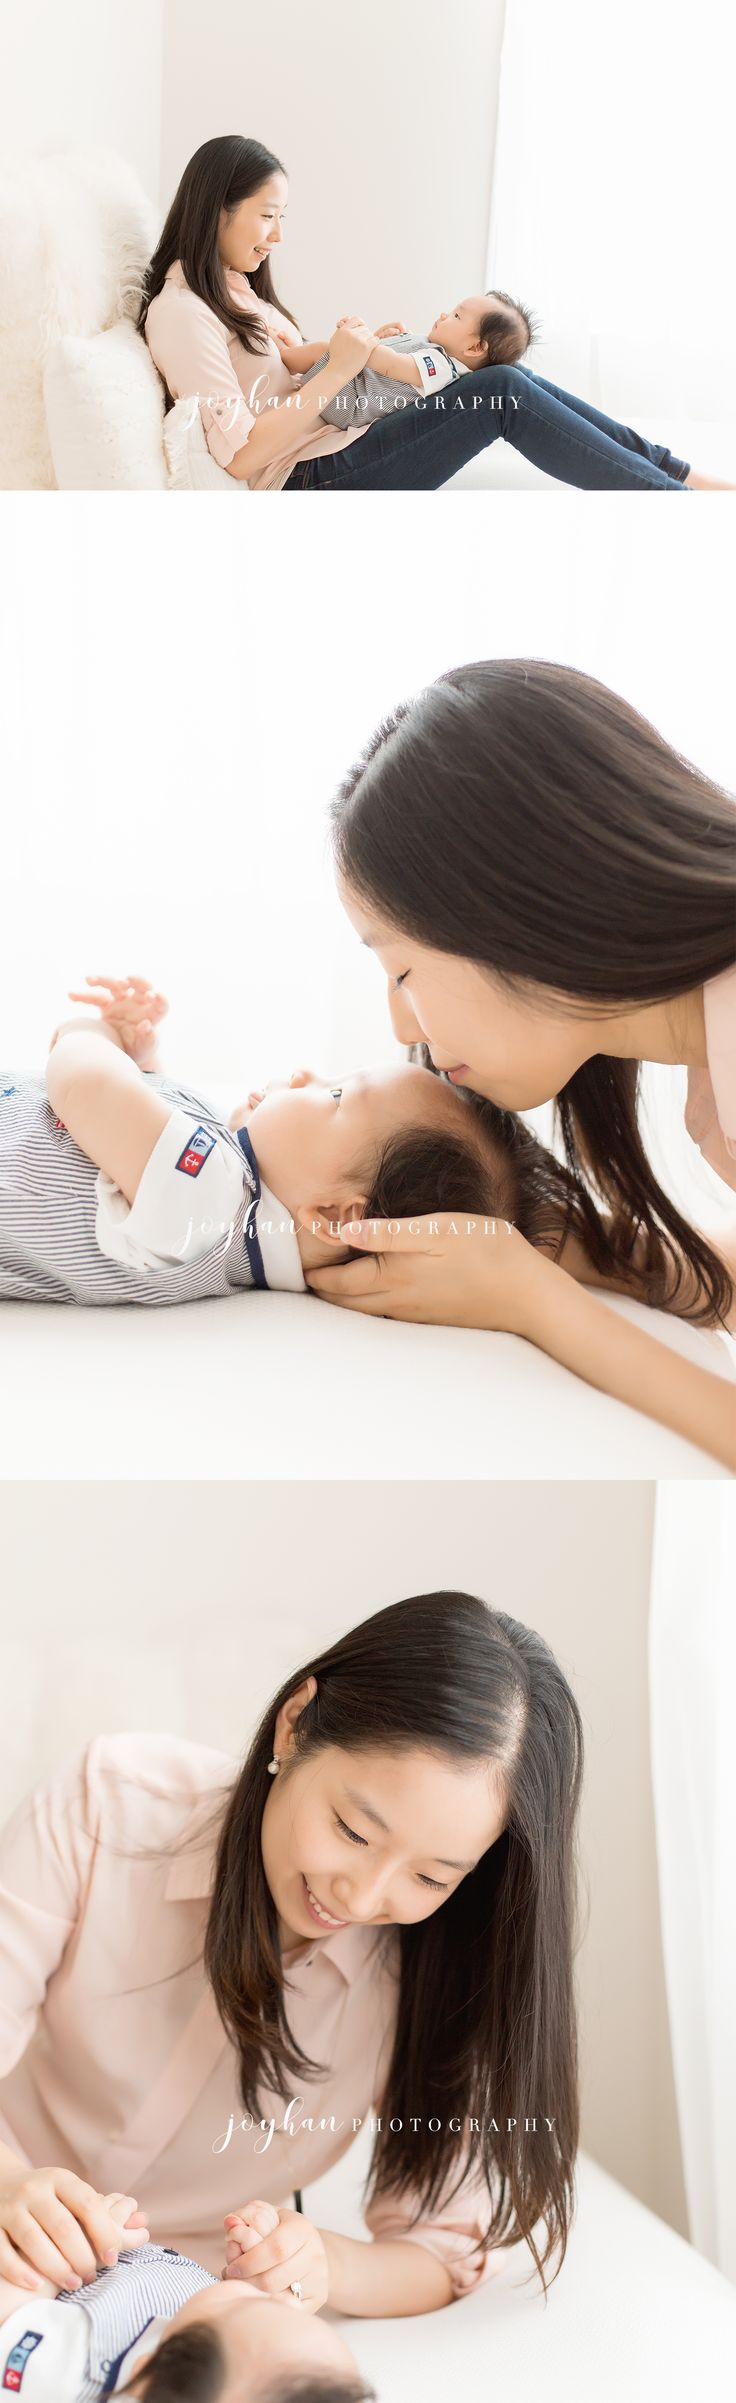 Baby Photography Posing Ideas for boy | Baby Photographer | Northern VA Baby Photographer | 100days Baby Photos | 3 month old Baby Photos | DC Photographer | 백일 | 백일사진 | Joy Han Photography |